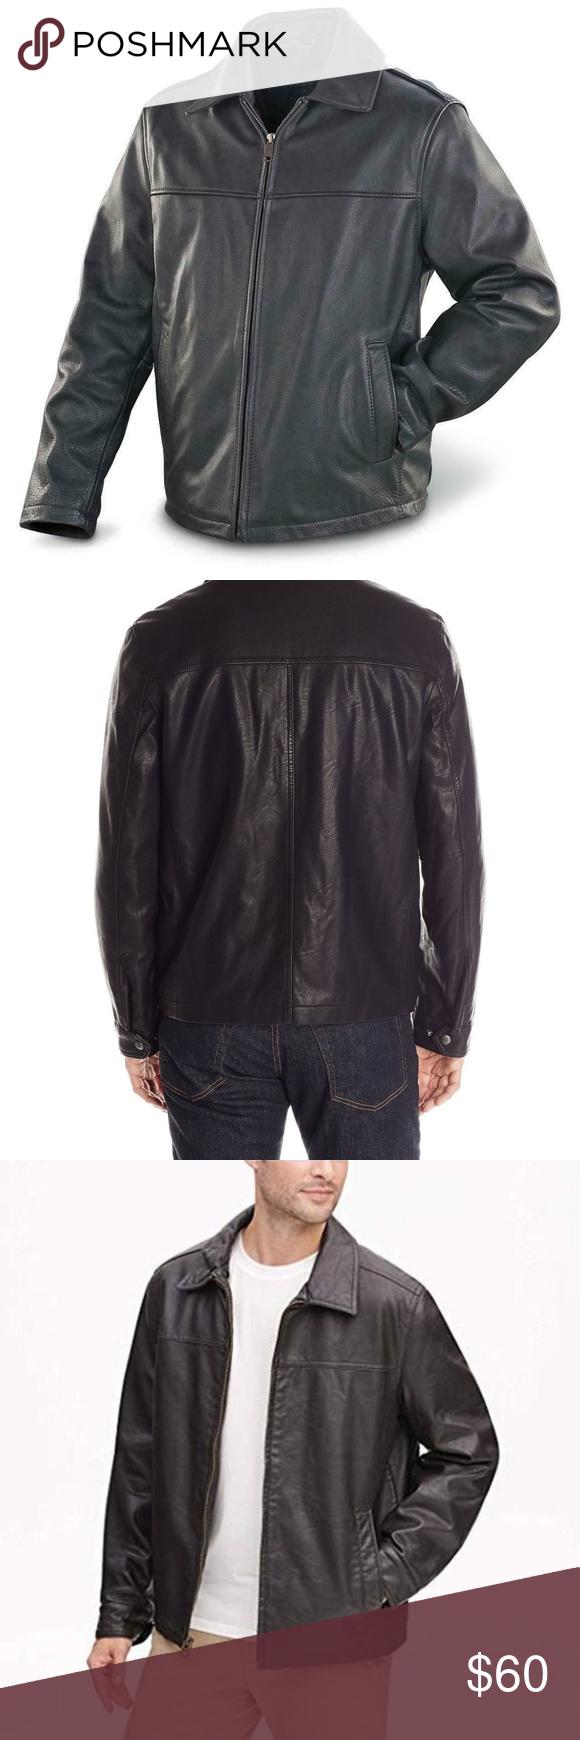 Docker Men's Coat Black Faux Leather Jacket New Black